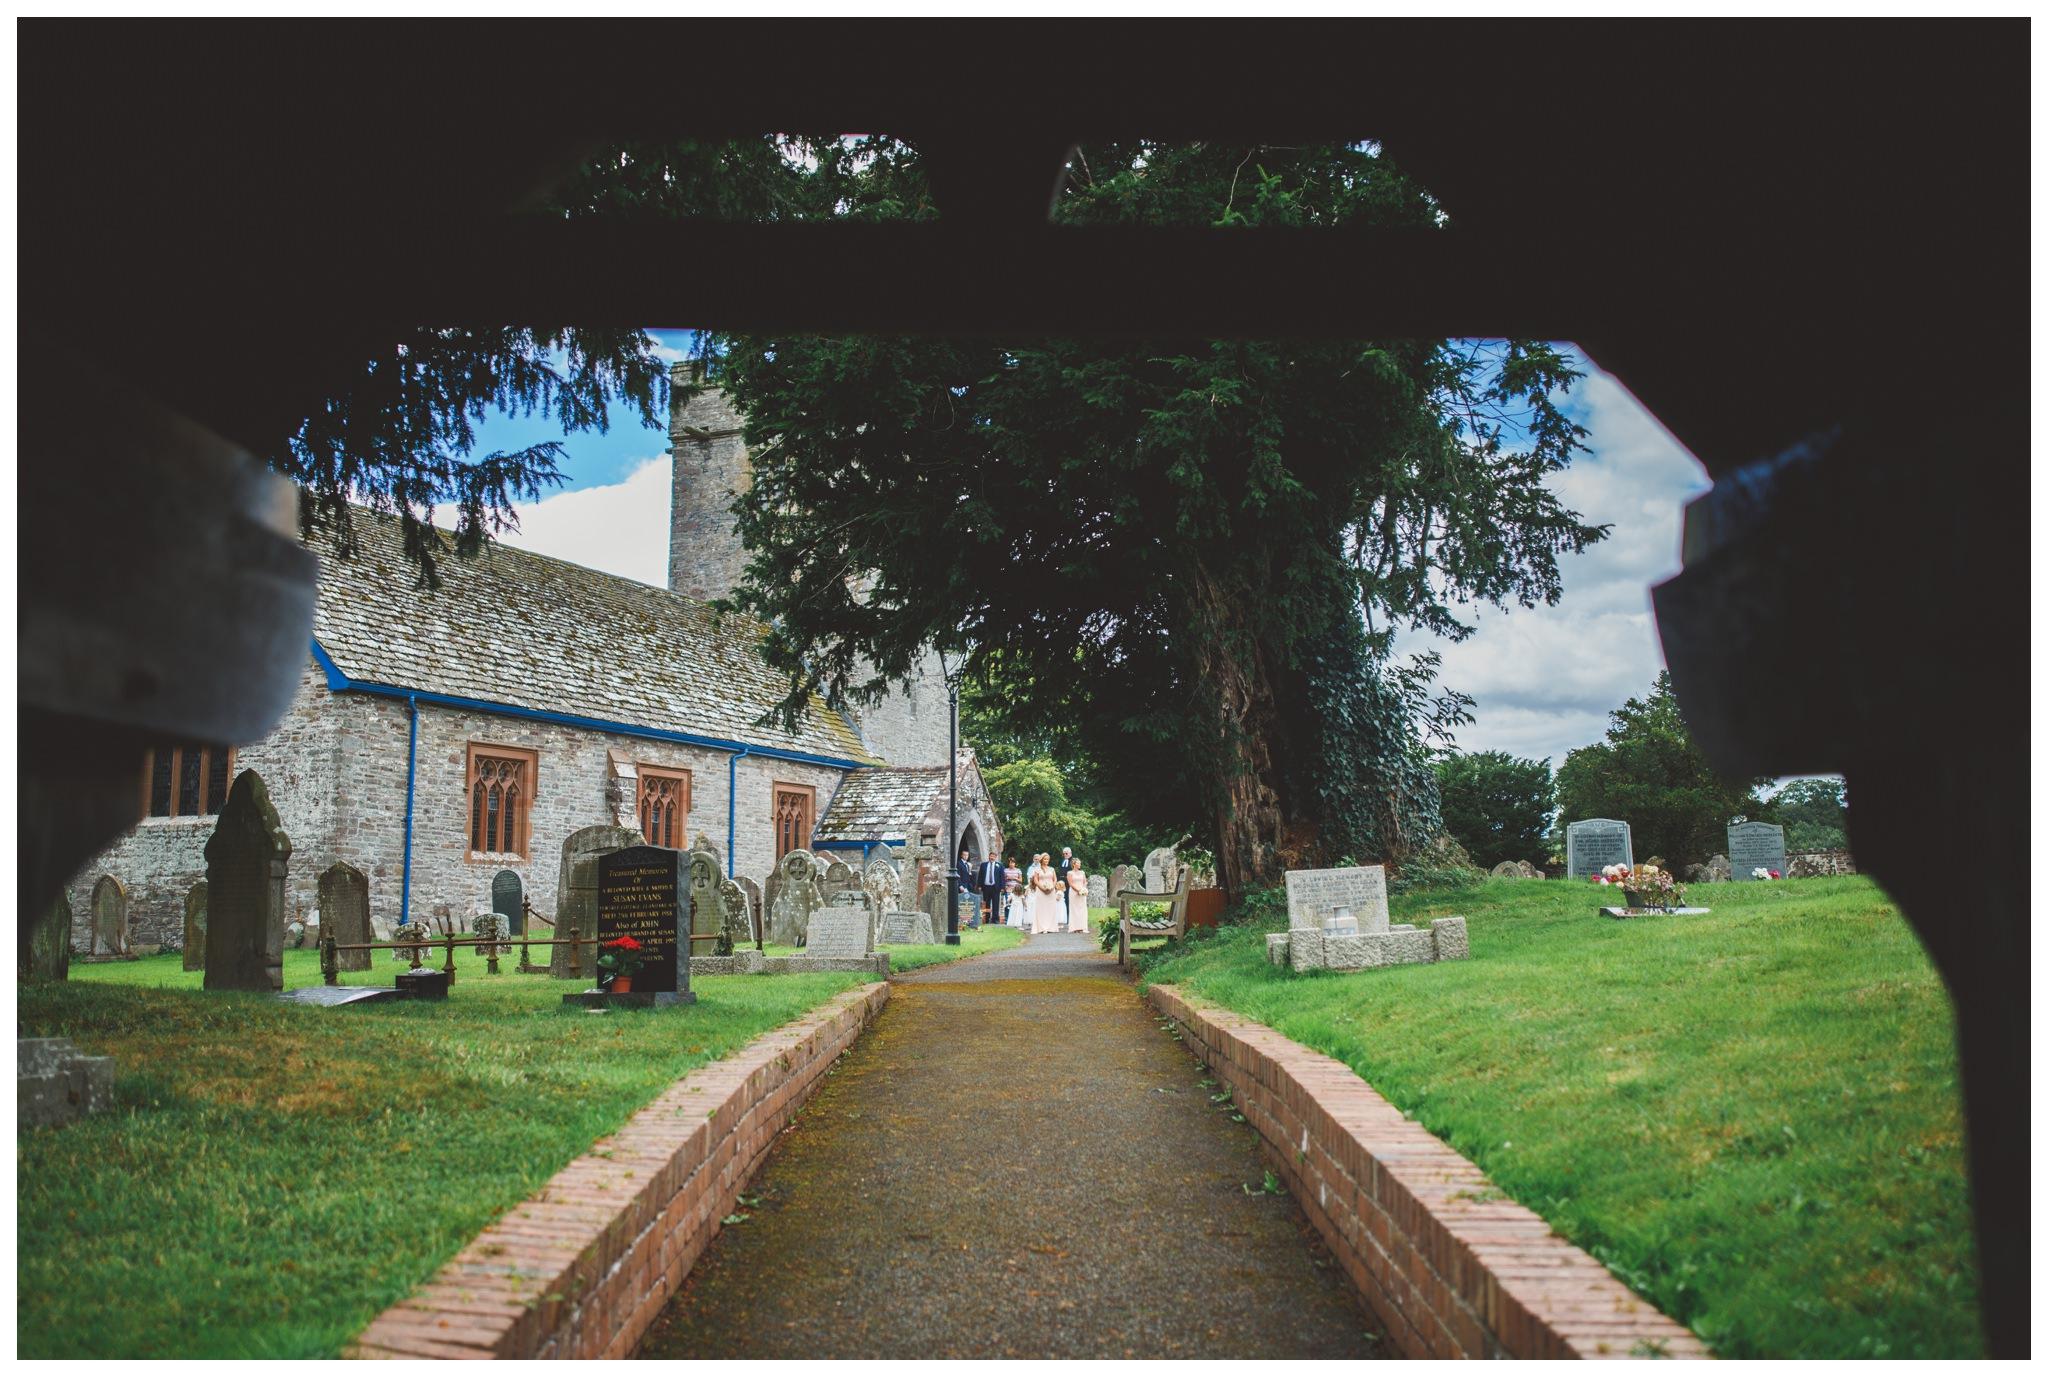 Richard Savage Photography - Wedding - Peterstone Court Brecon - 2016-05-11_0021